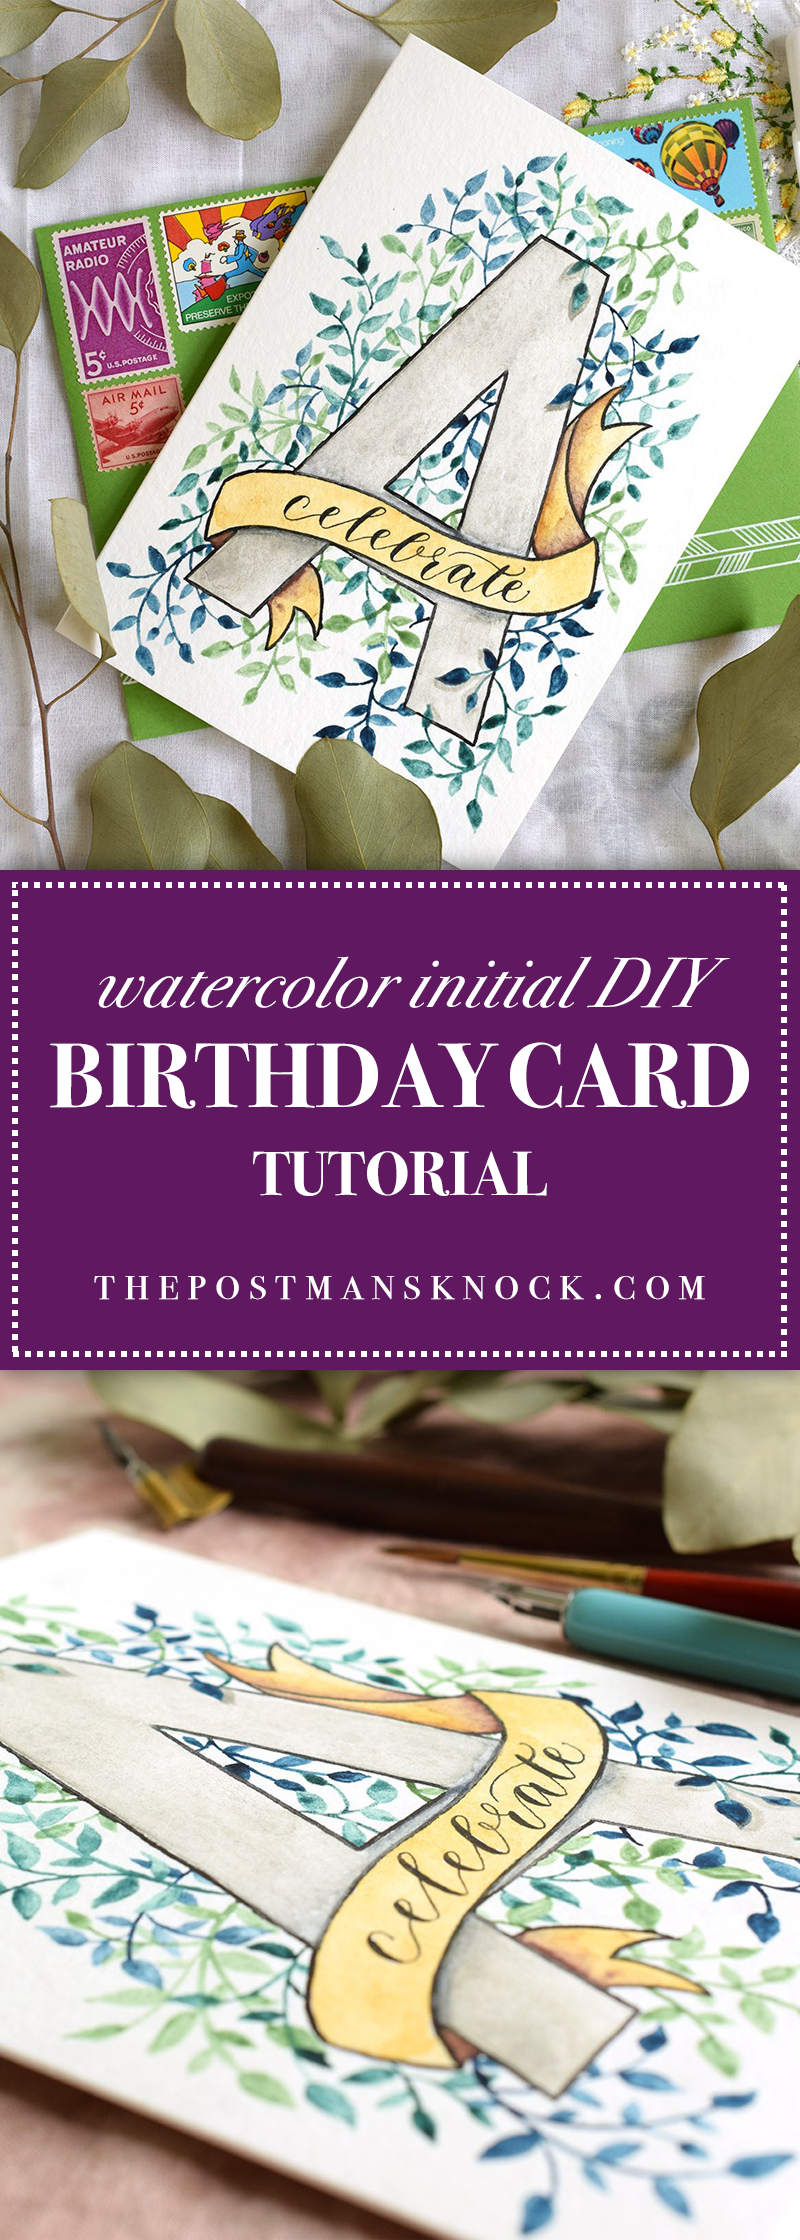 Watercolor Initial DIY Birthday Card Tutorial | The ...